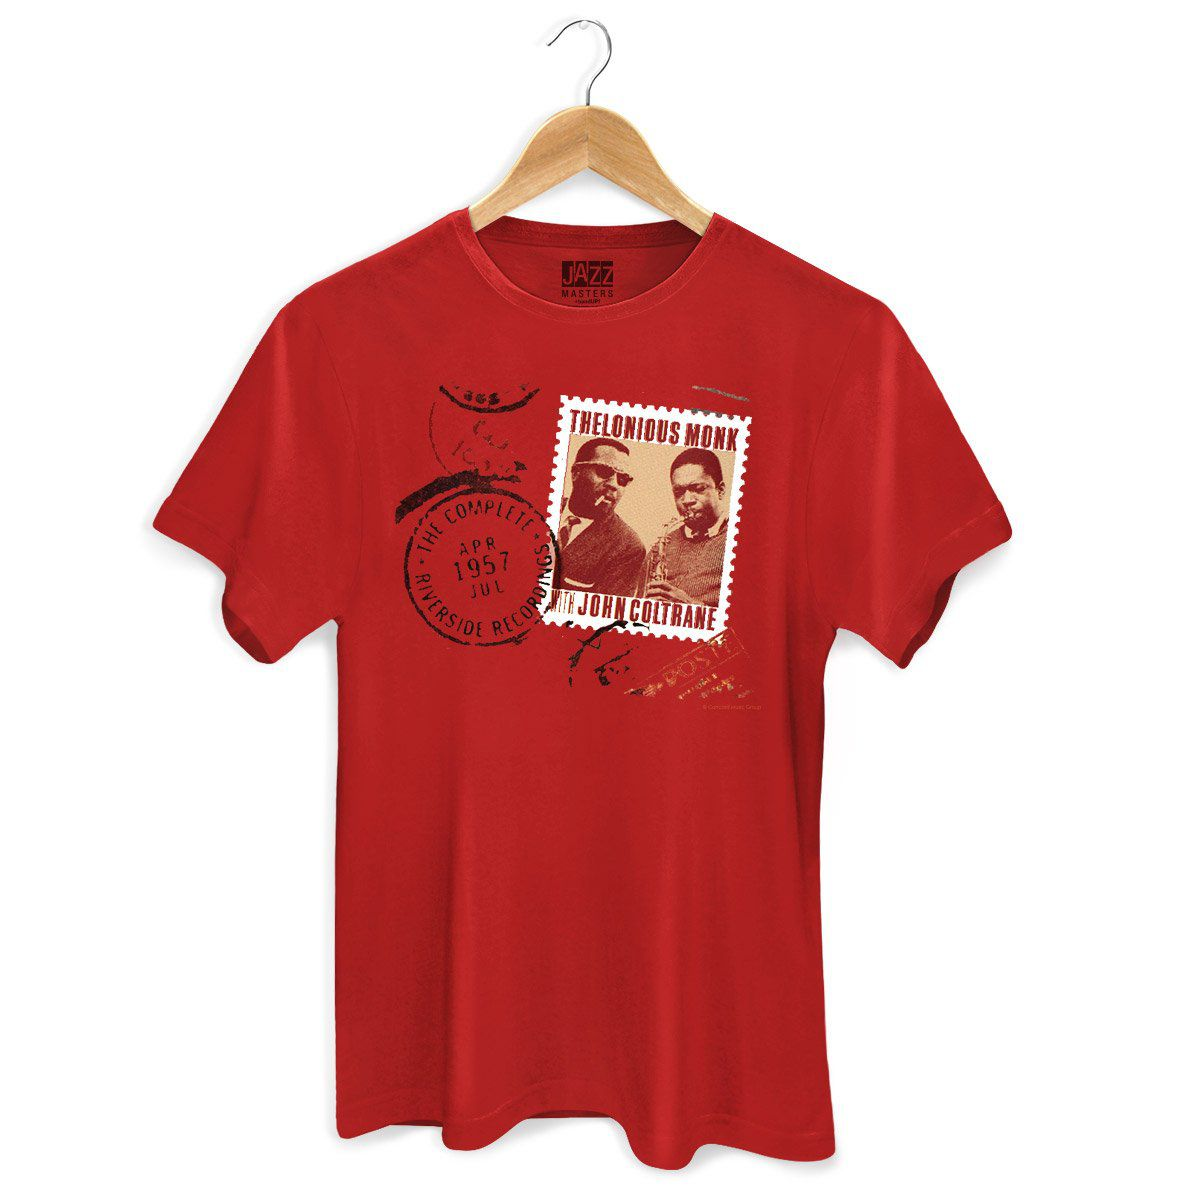 Camiseta Masculina Thelonious Monk With John Coltrane  - bandUP Store Marketplace